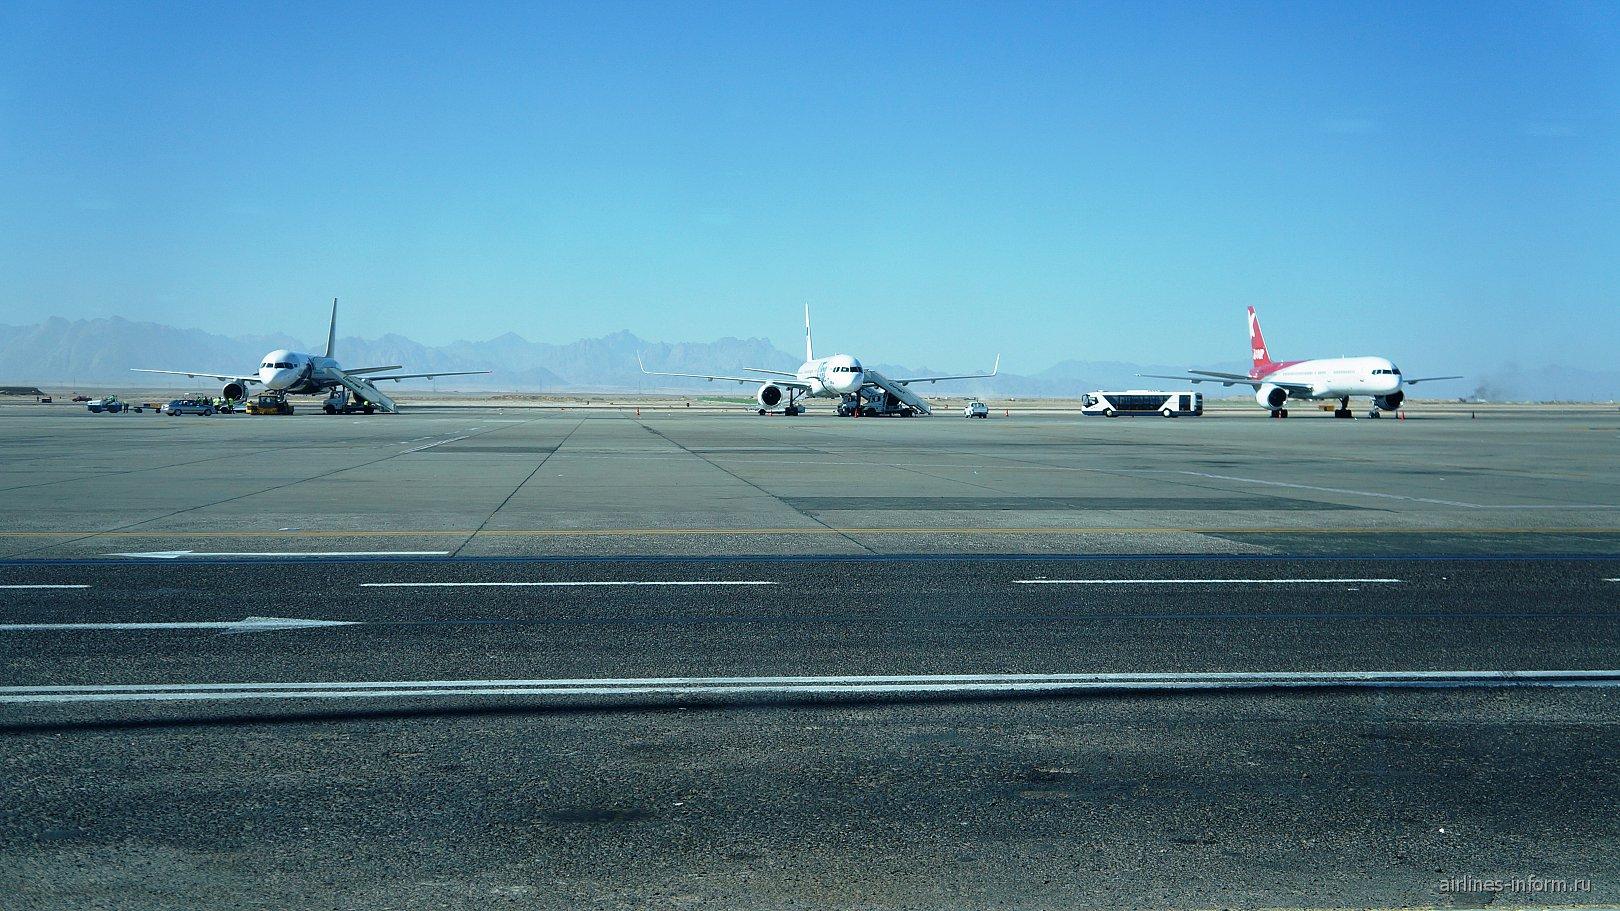 Самолеты на перроне аэропорта Хургада